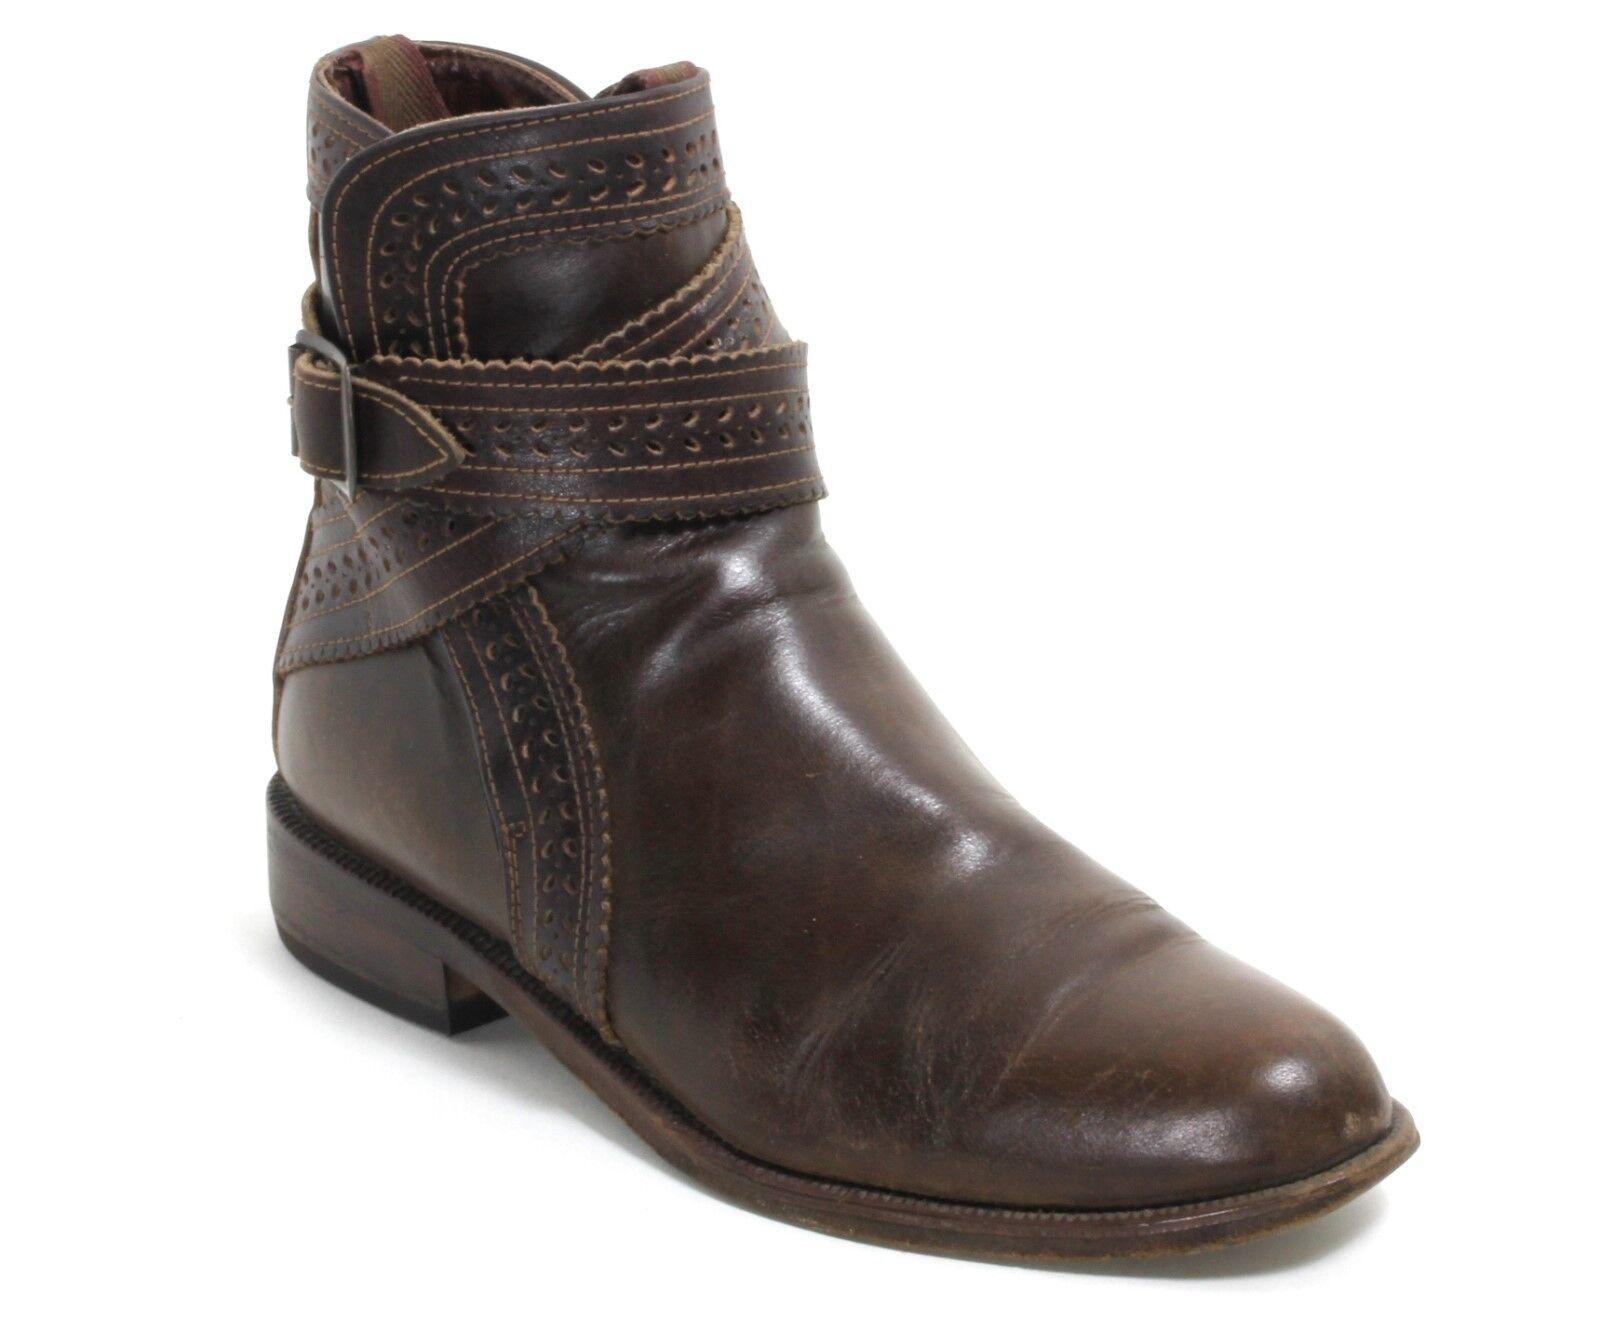 Stivali da Donna Vintage Stivali Stivaletti Chelsea Stivali Western Scarpe 35,5 - 36